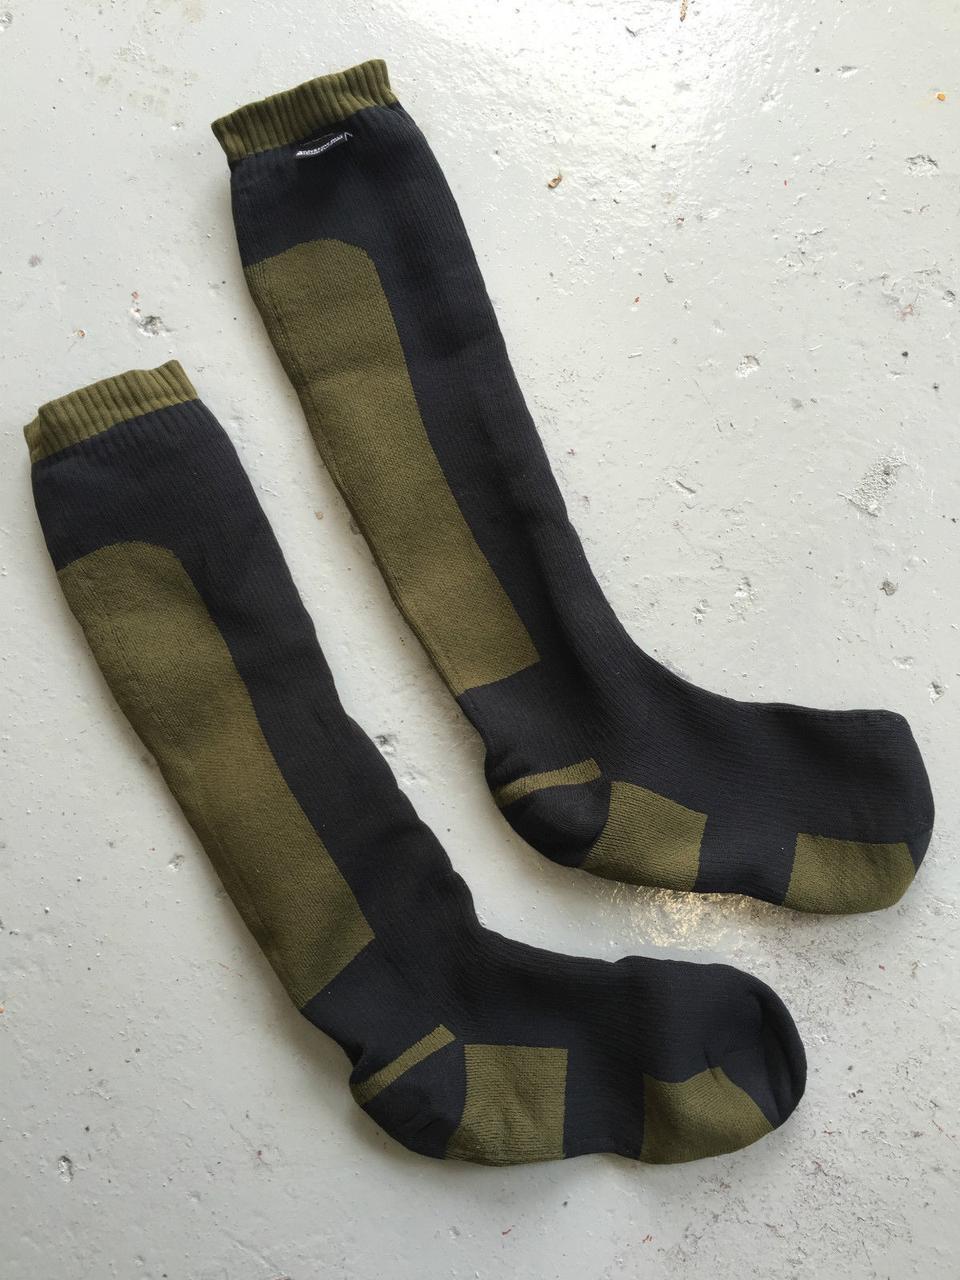 Носки водонепроницаемые Sealskinz Military Issue армии Британии Б/У Высший сорт